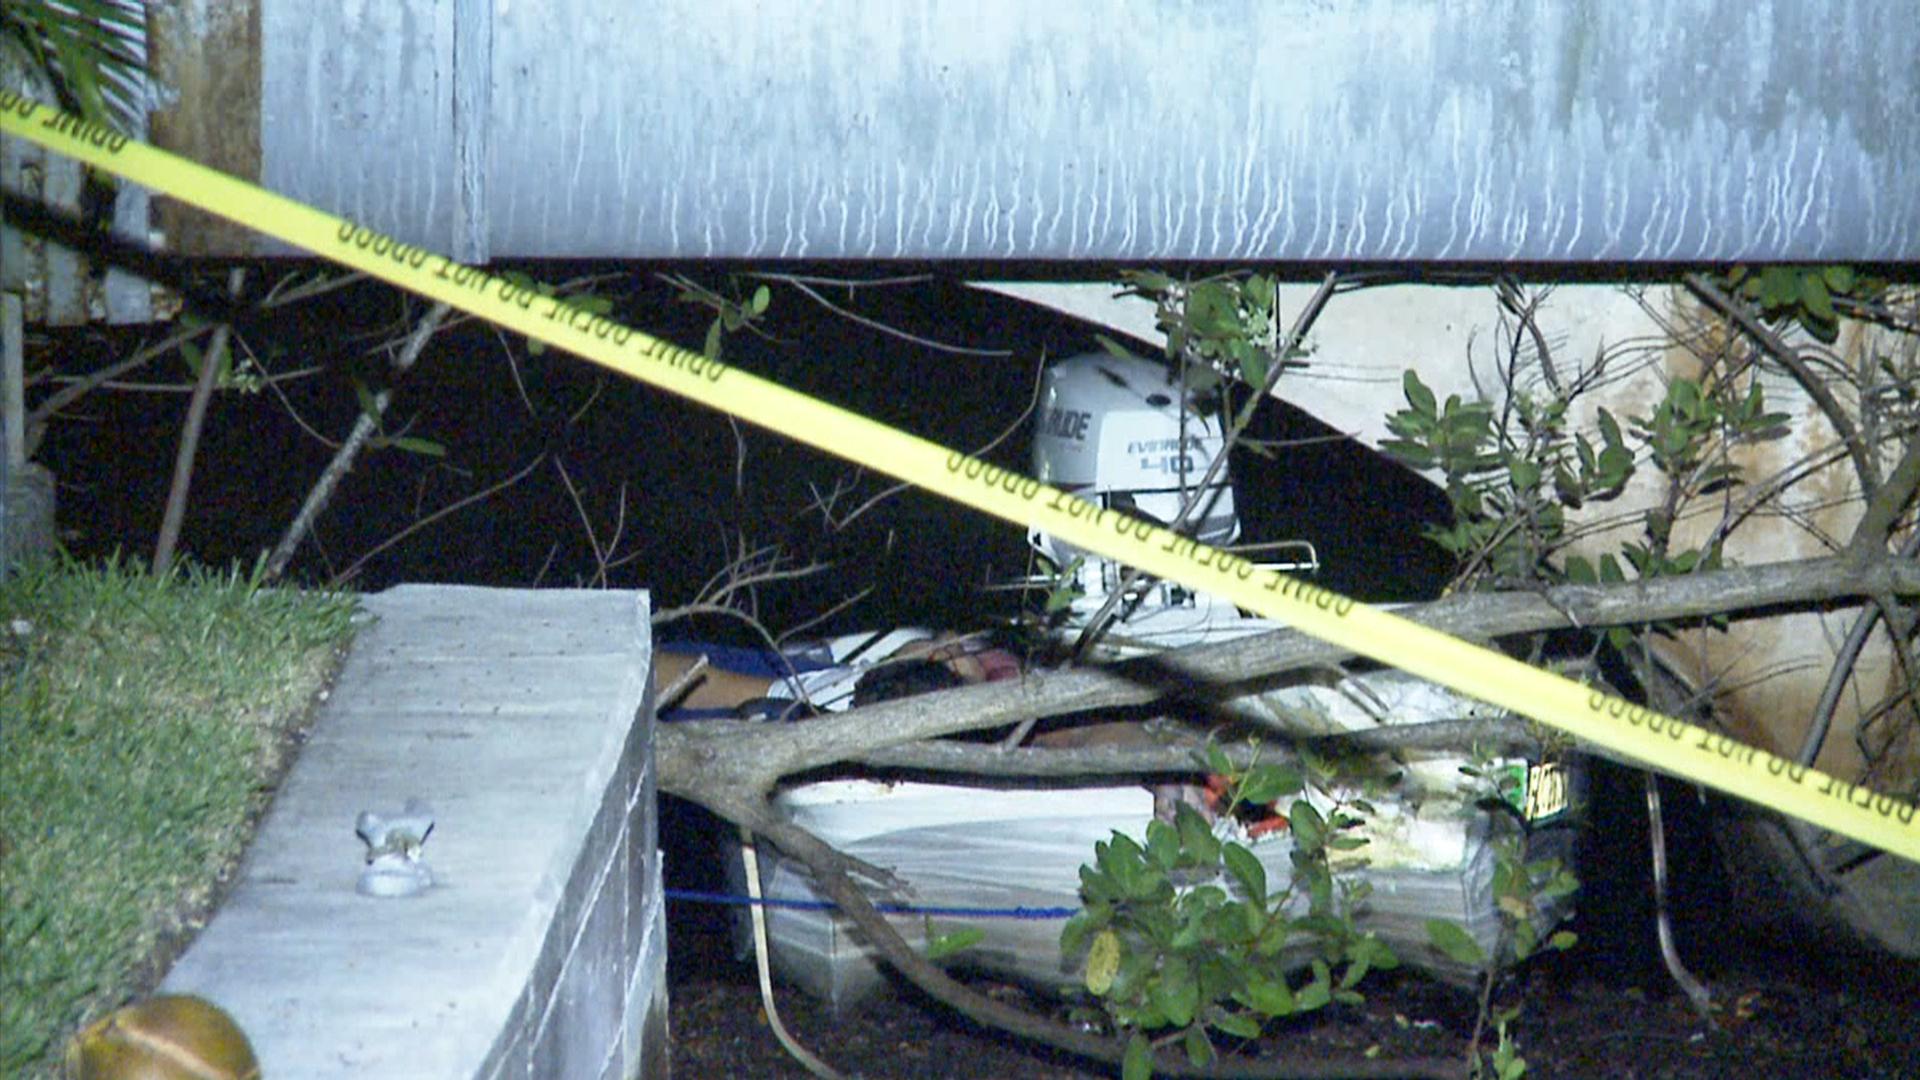 Tdy Mor Boating Teen Dead Cinci Hurt In When Boat Ft Lauderdale Strikes